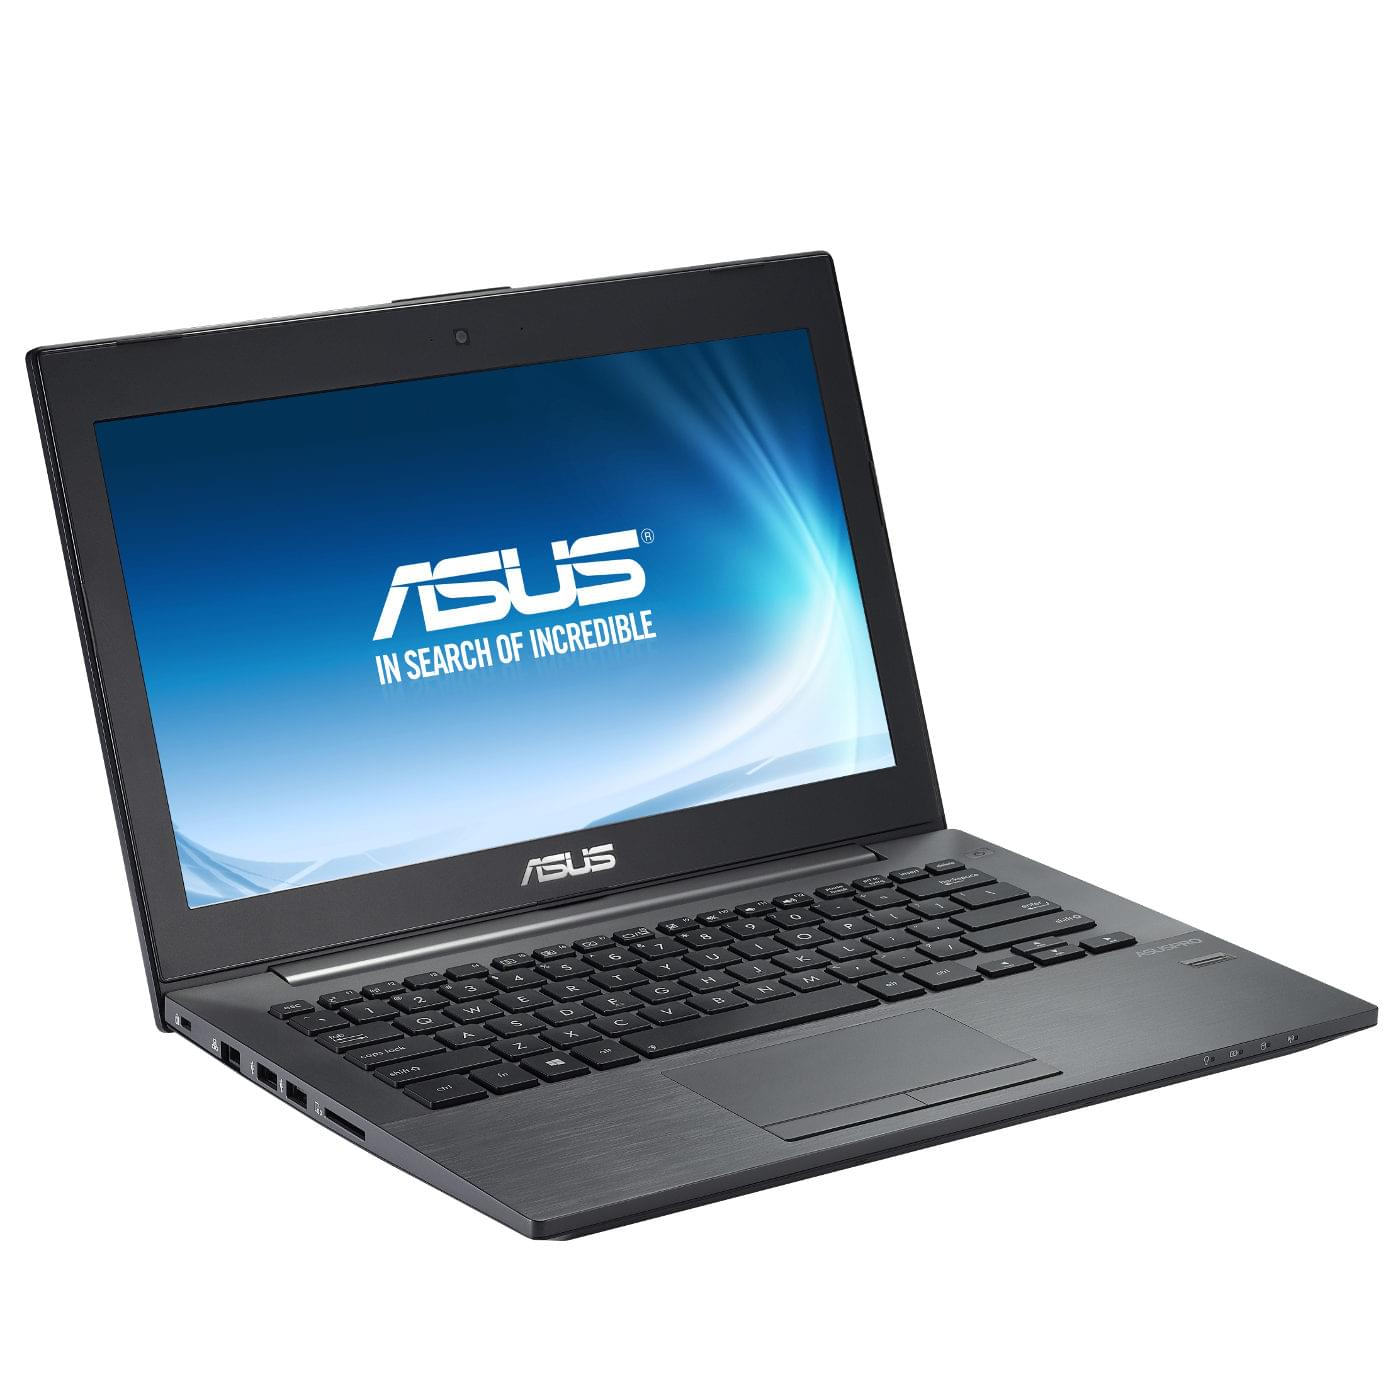 Asus PU301LA-RO123G (PU301LA-RO123G) - Achat / Vente PC Portable sur Cybertek.fr - 0